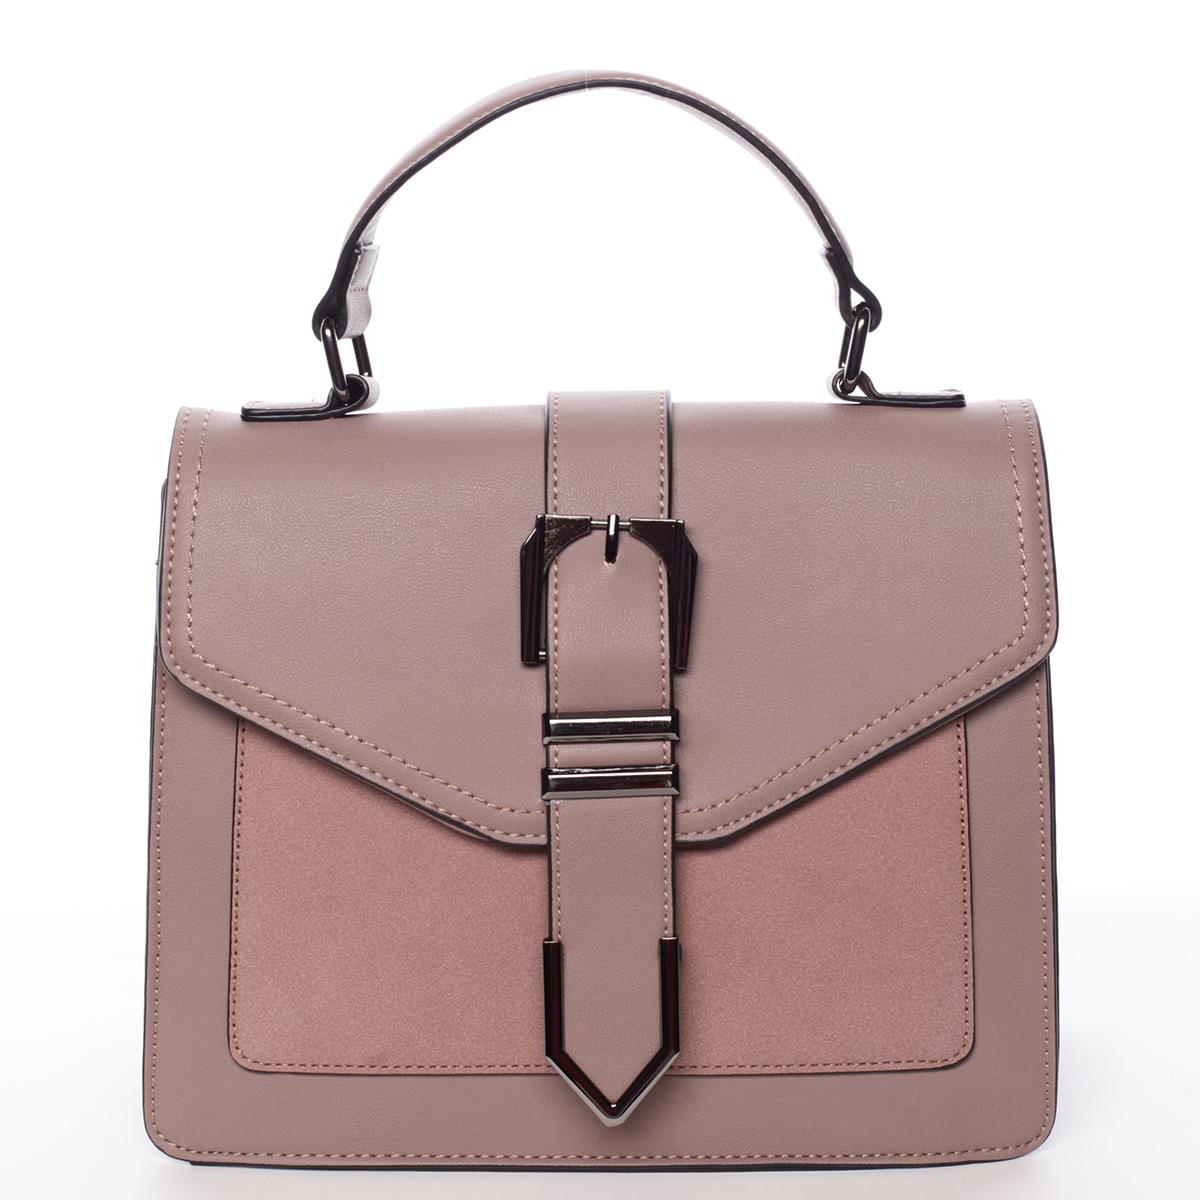 Nadčasová dámska kabelka do ruky ružová - MARIA C Justice